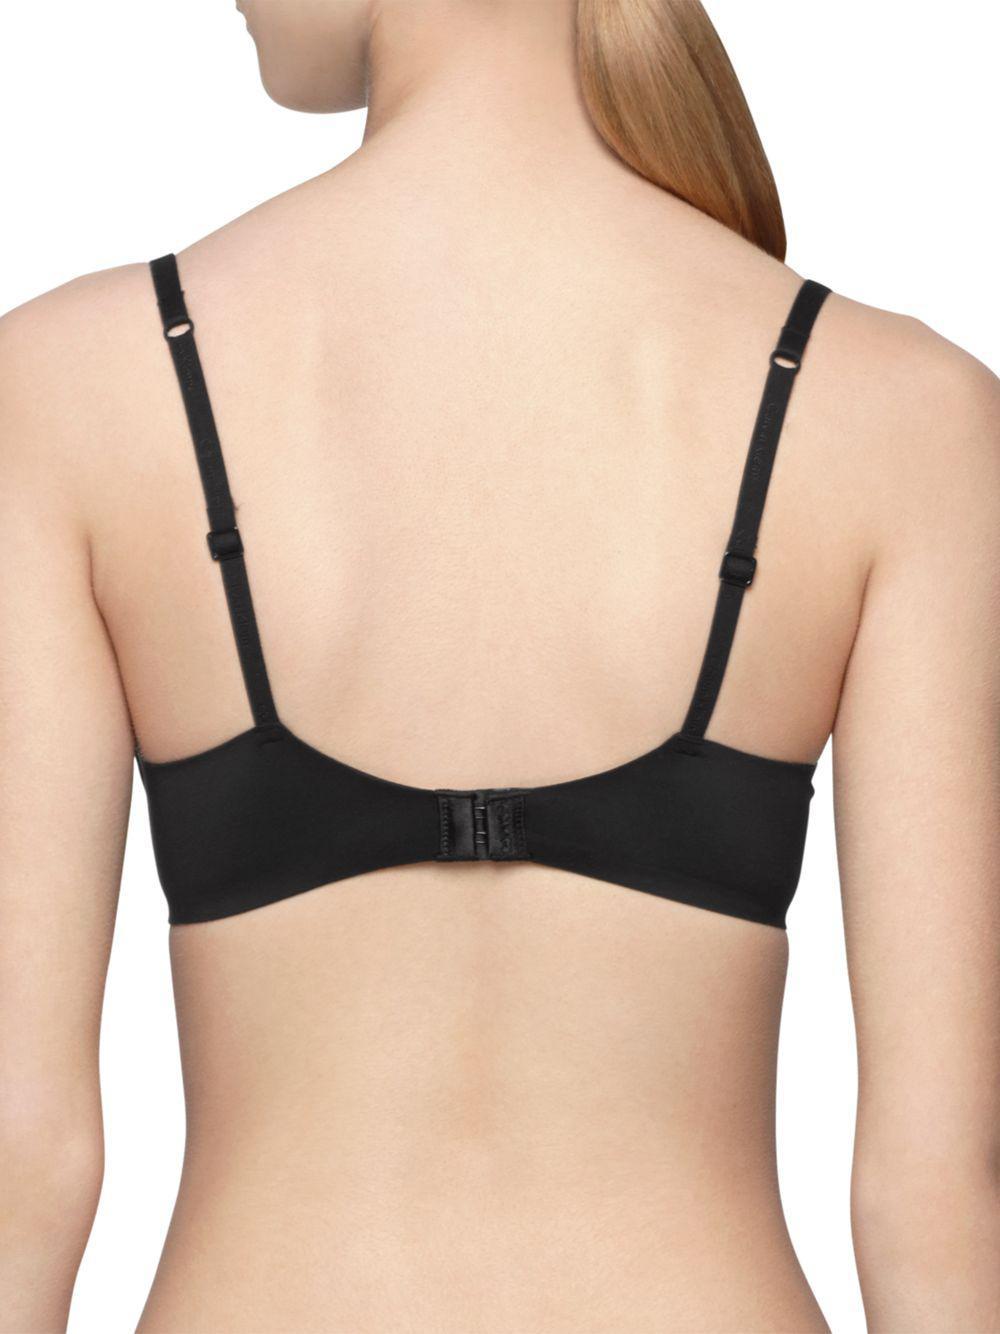 b1f9061ae1ba7 Calvin Klein - Black Perfectly Fit Plunge Racerback Bra - Lyst. View  fullscreen